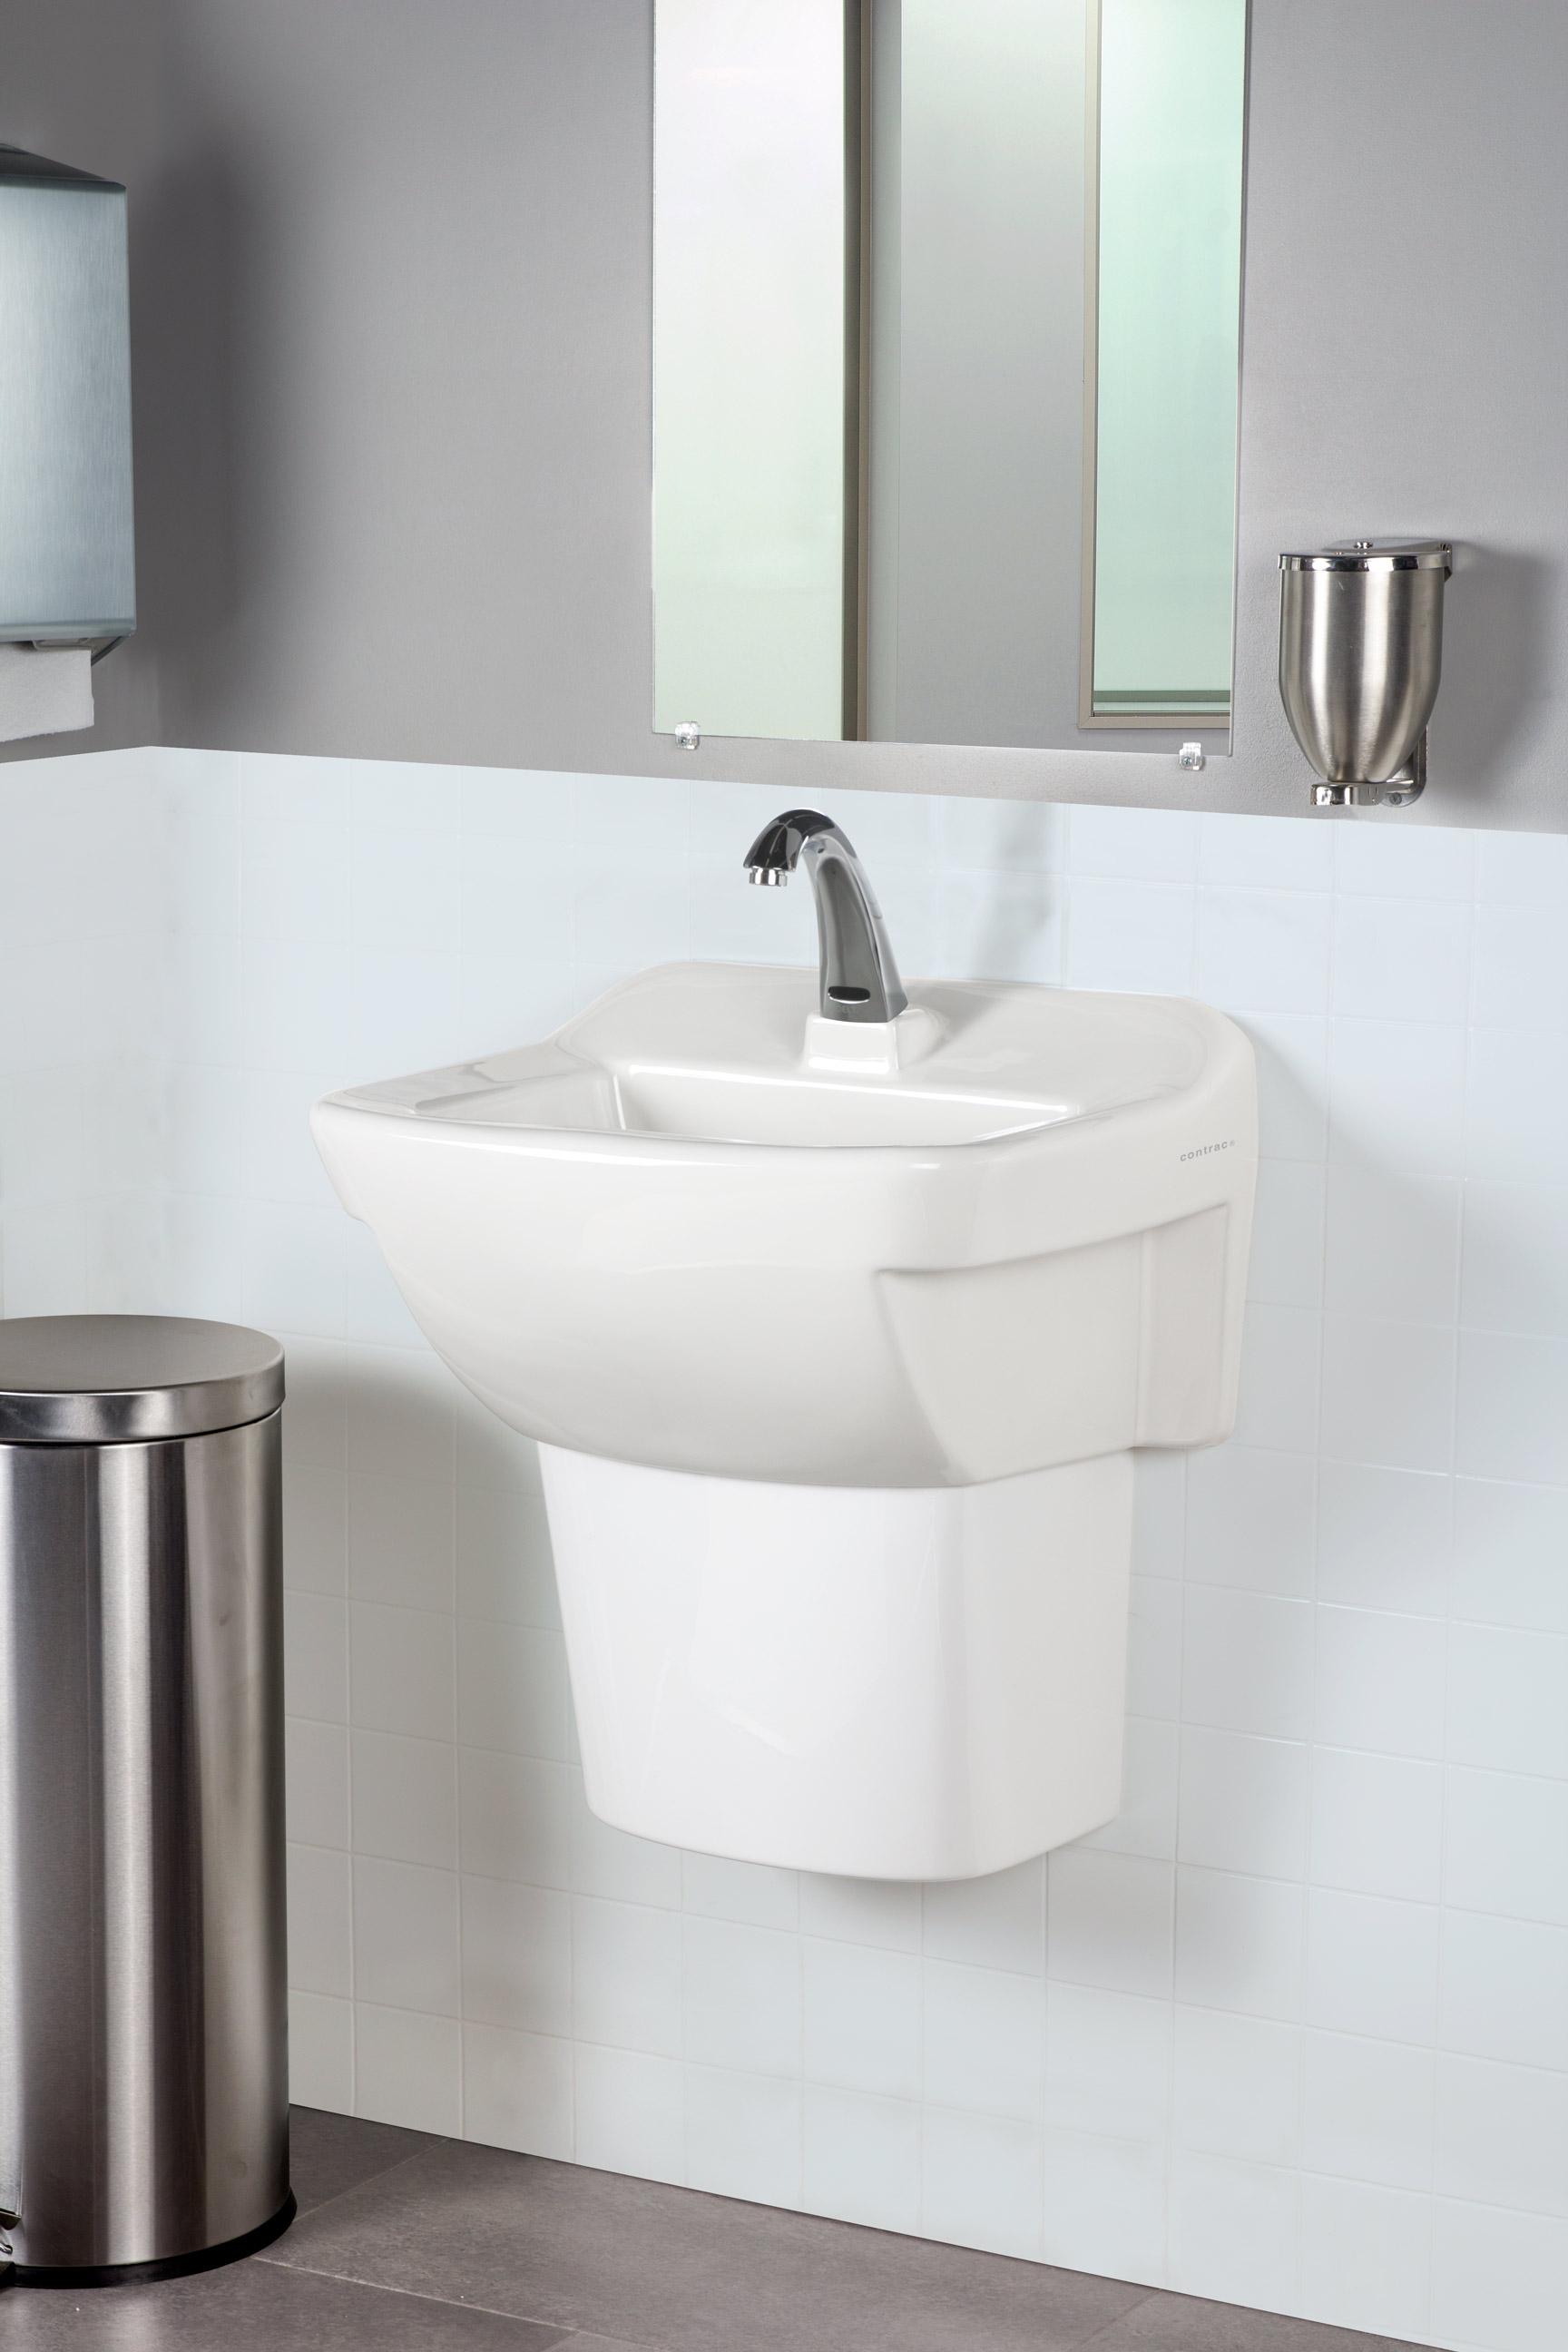 HandwashingSink_RoomScene_blue_LowRes.jpg